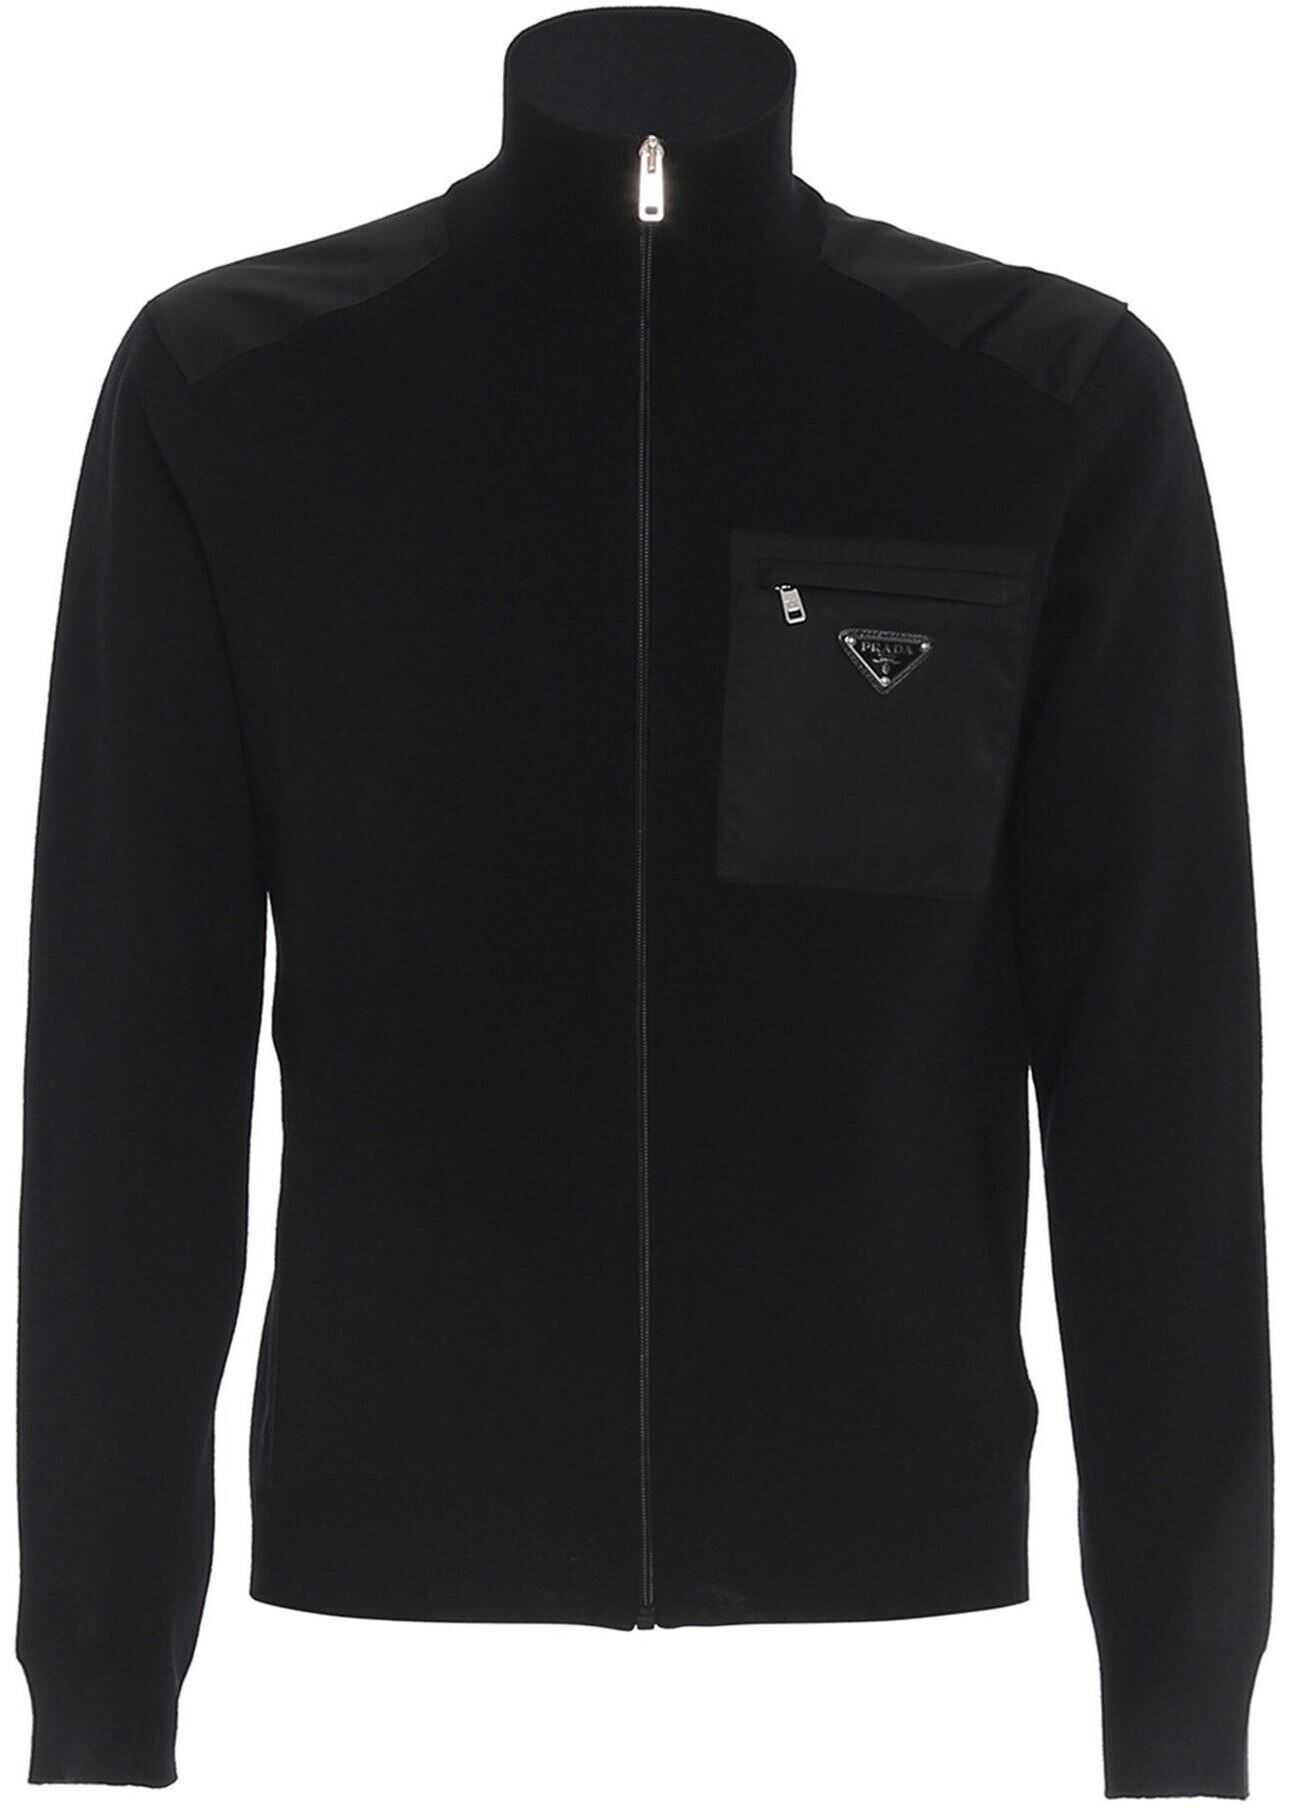 Prada Zipped Wool Cardigan In Black Black imagine